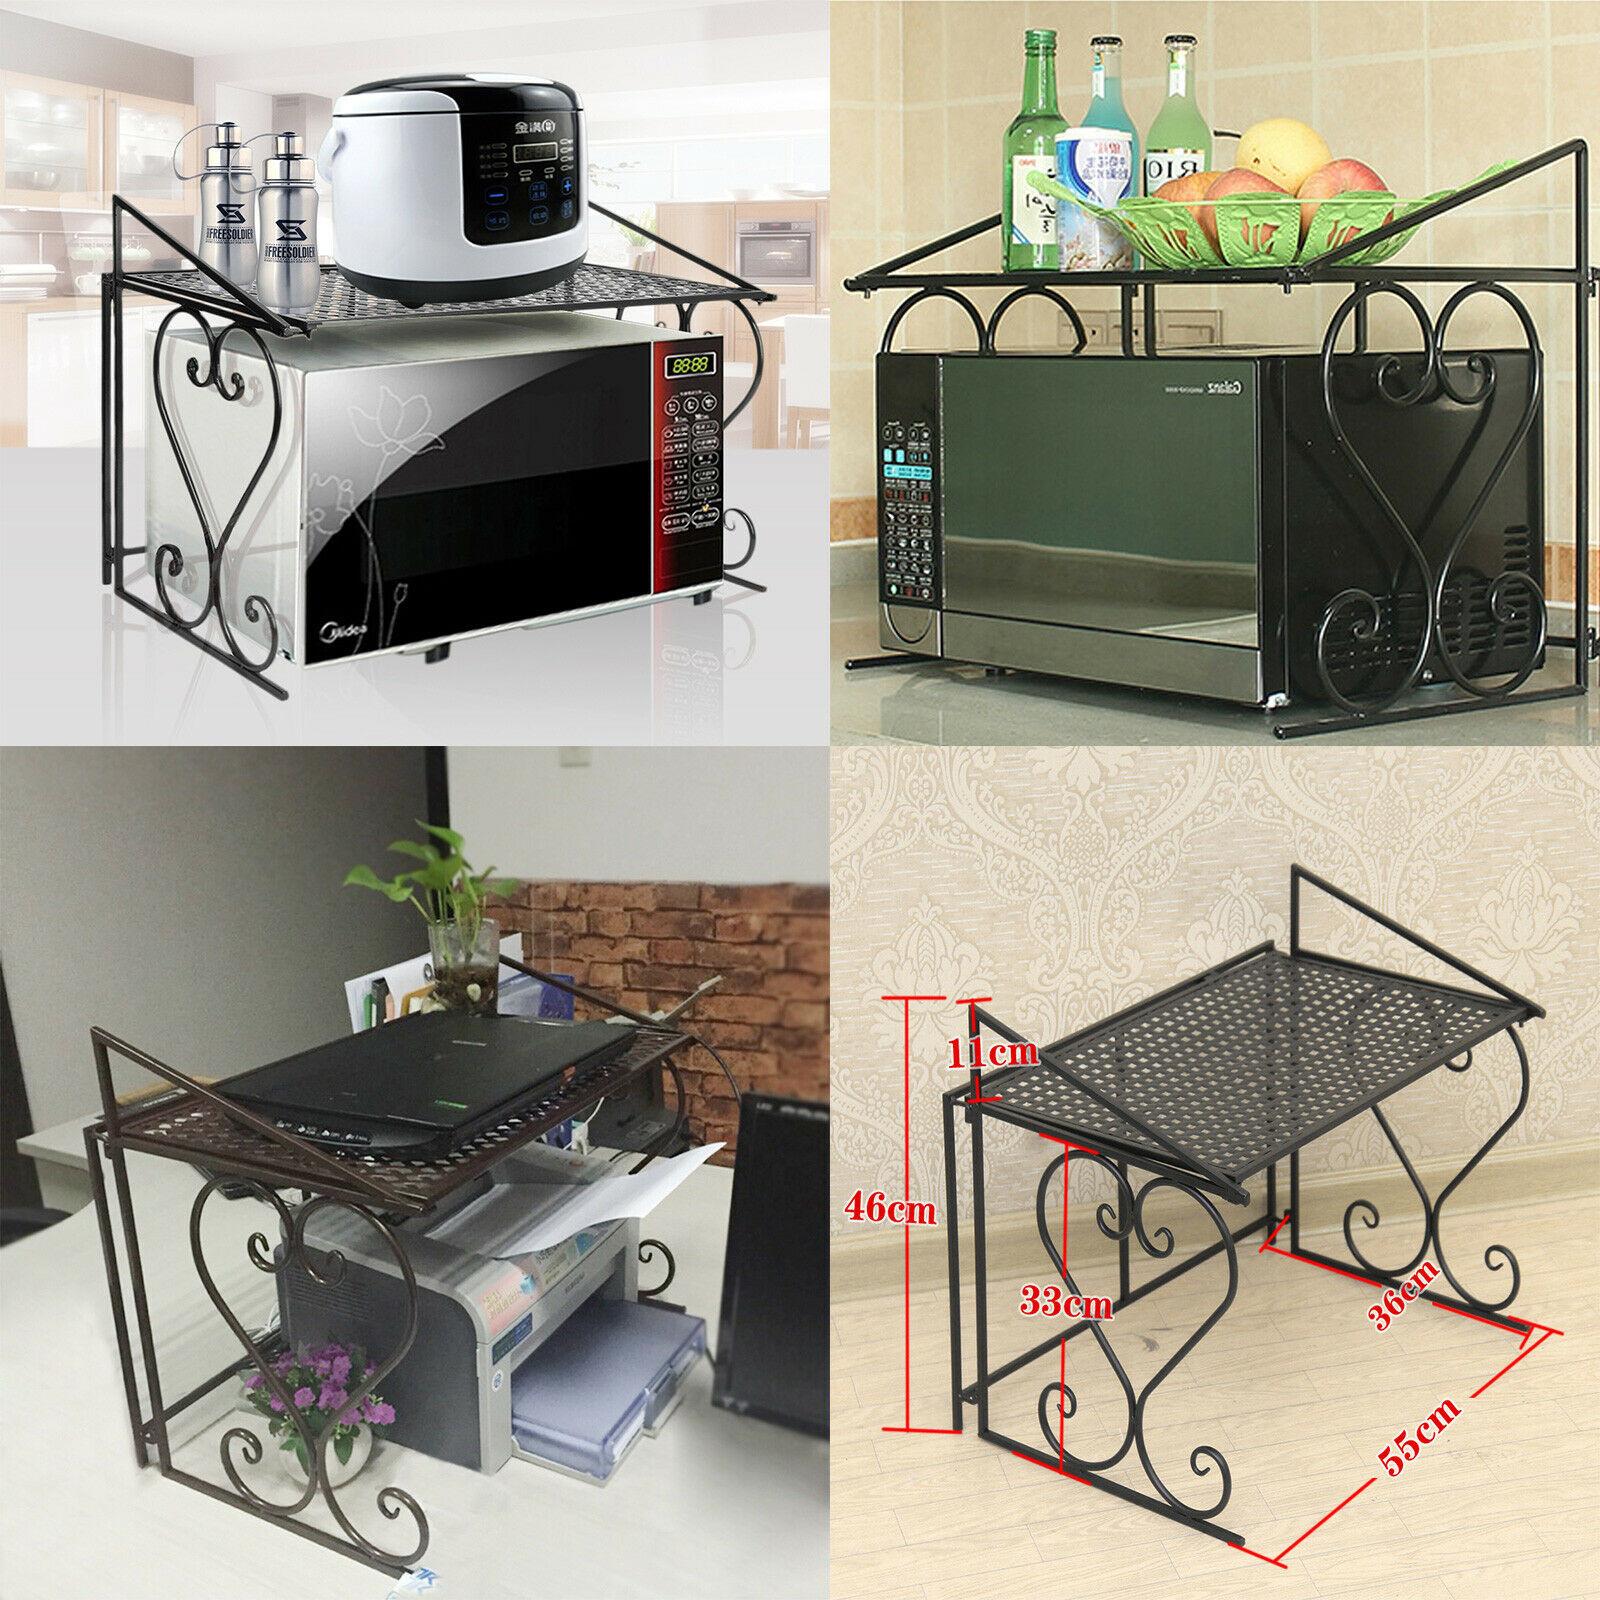 Kitchen Cabinet Shelves Organizer  Microwave Oven Rack Kitchen Organizer Counter Cabinet